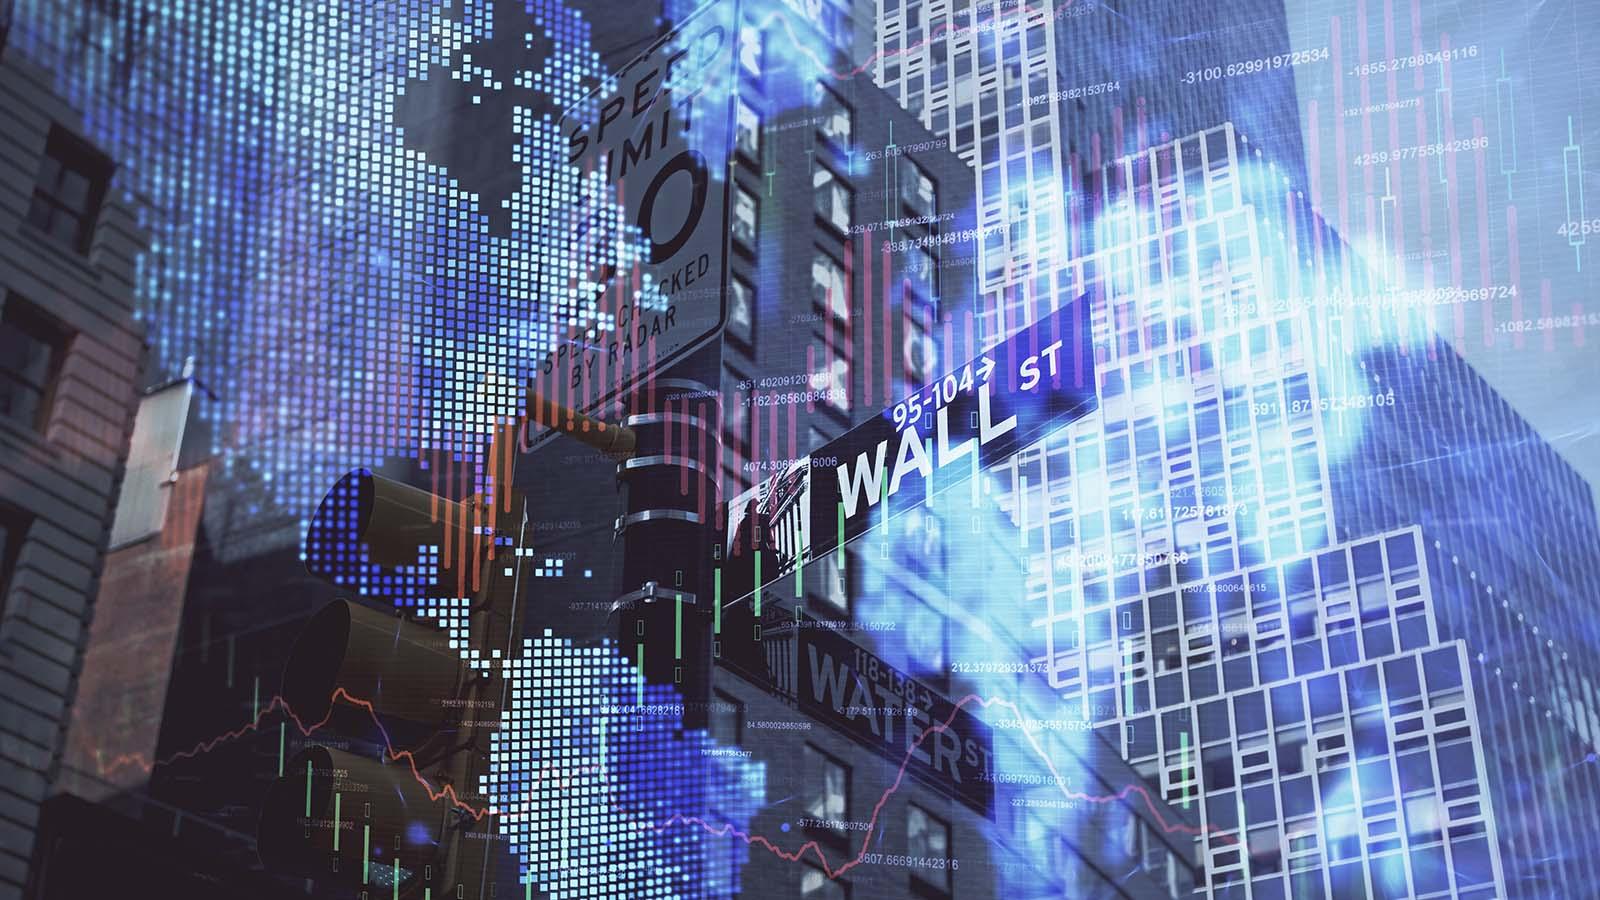 PLTR, FB, TSLA, AMZN, MSFT Why Are Tech Stocks Down Today ...